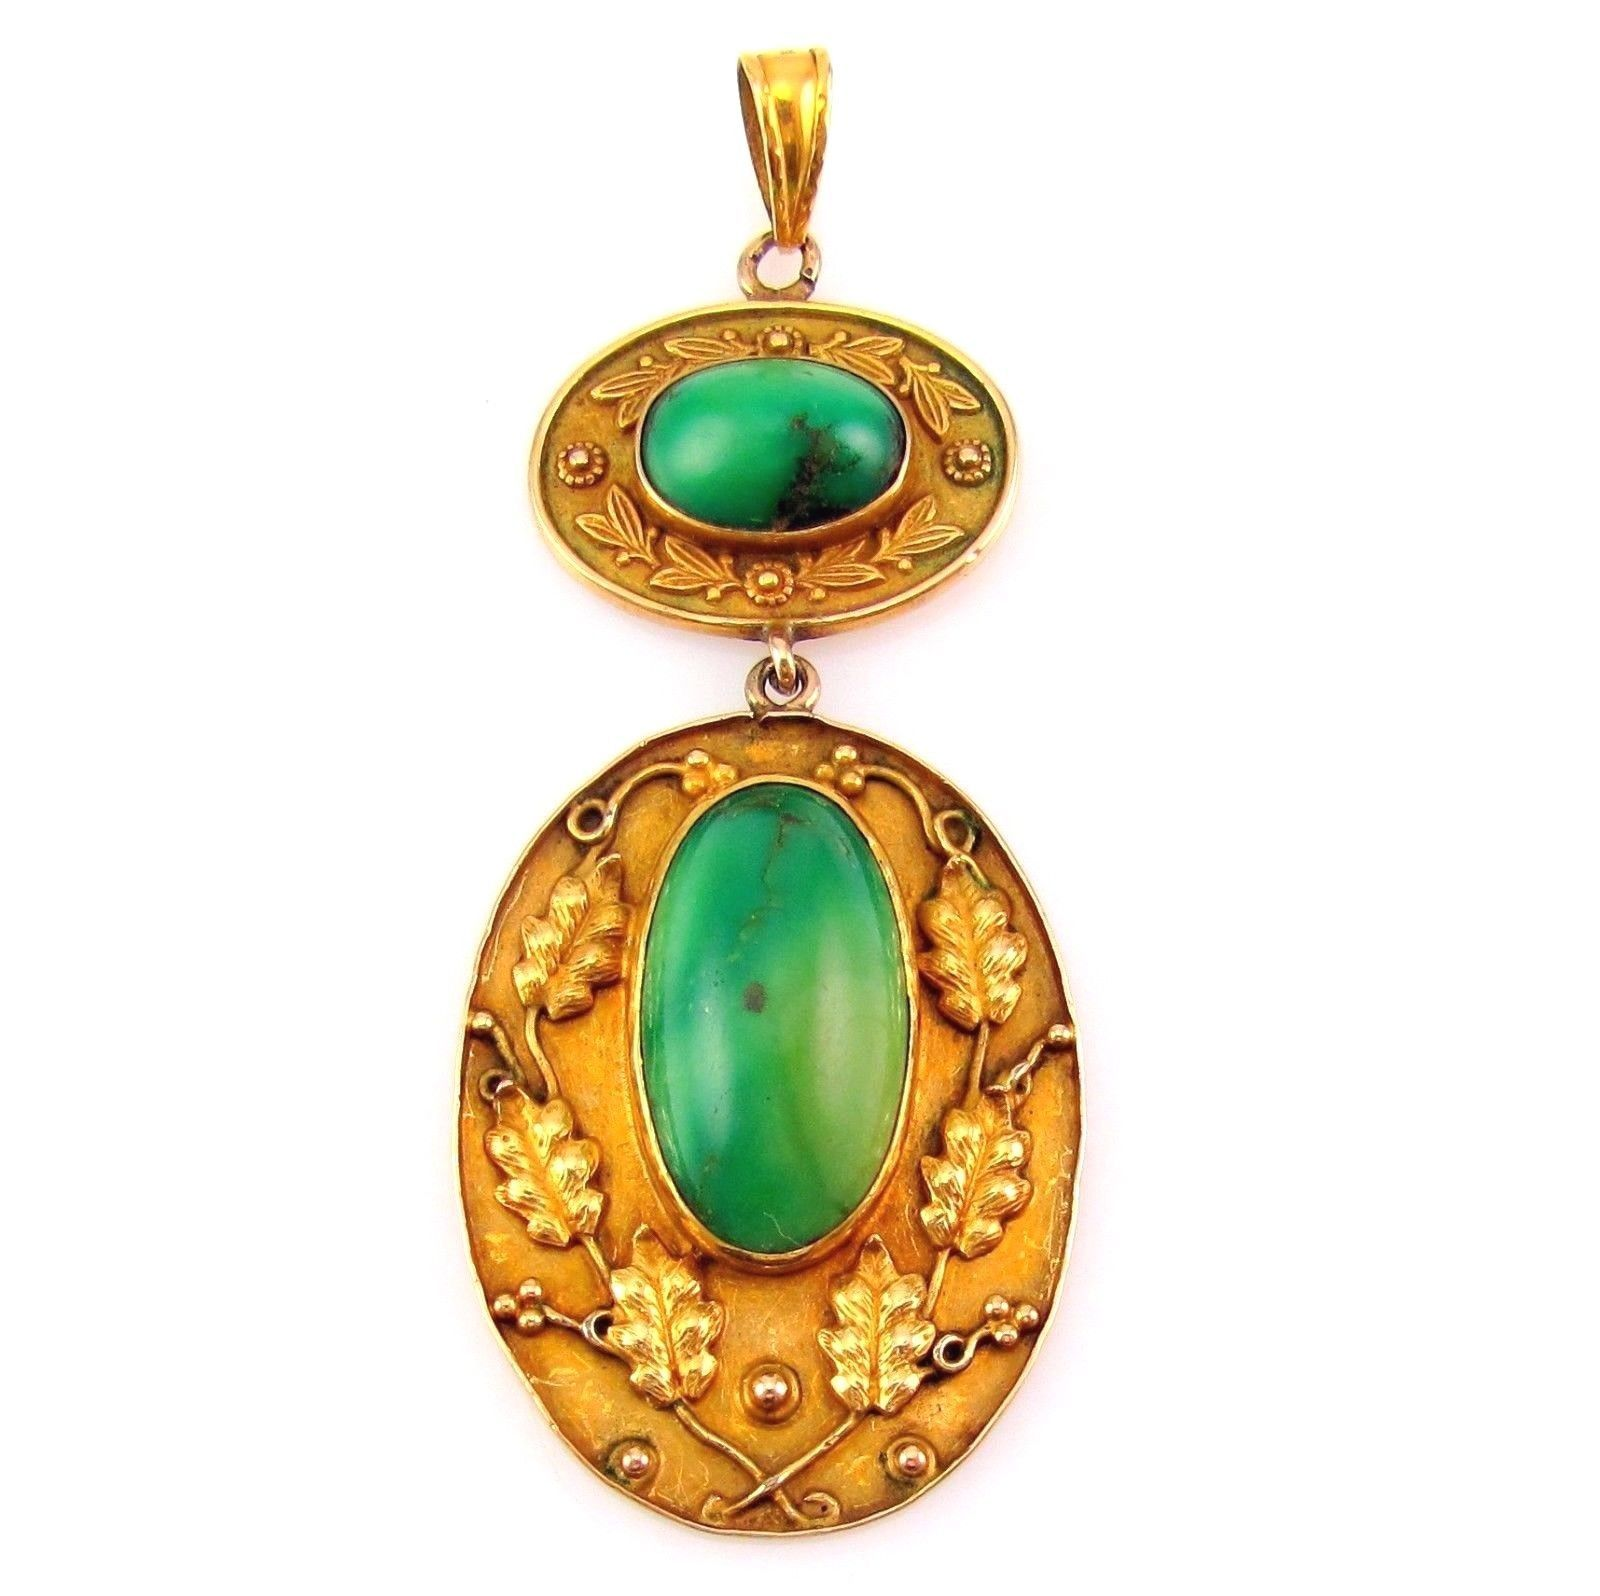 Antique Arts & Crafts Natural Turquoise Estate Pendant 10K Yellow Gold | FJ IM in Jewelry & Watches, Vintage & Antique Jewelry, Fine, Art Nouveau/Art Deco 1895-1935, Necklaces & Pendants | eBay